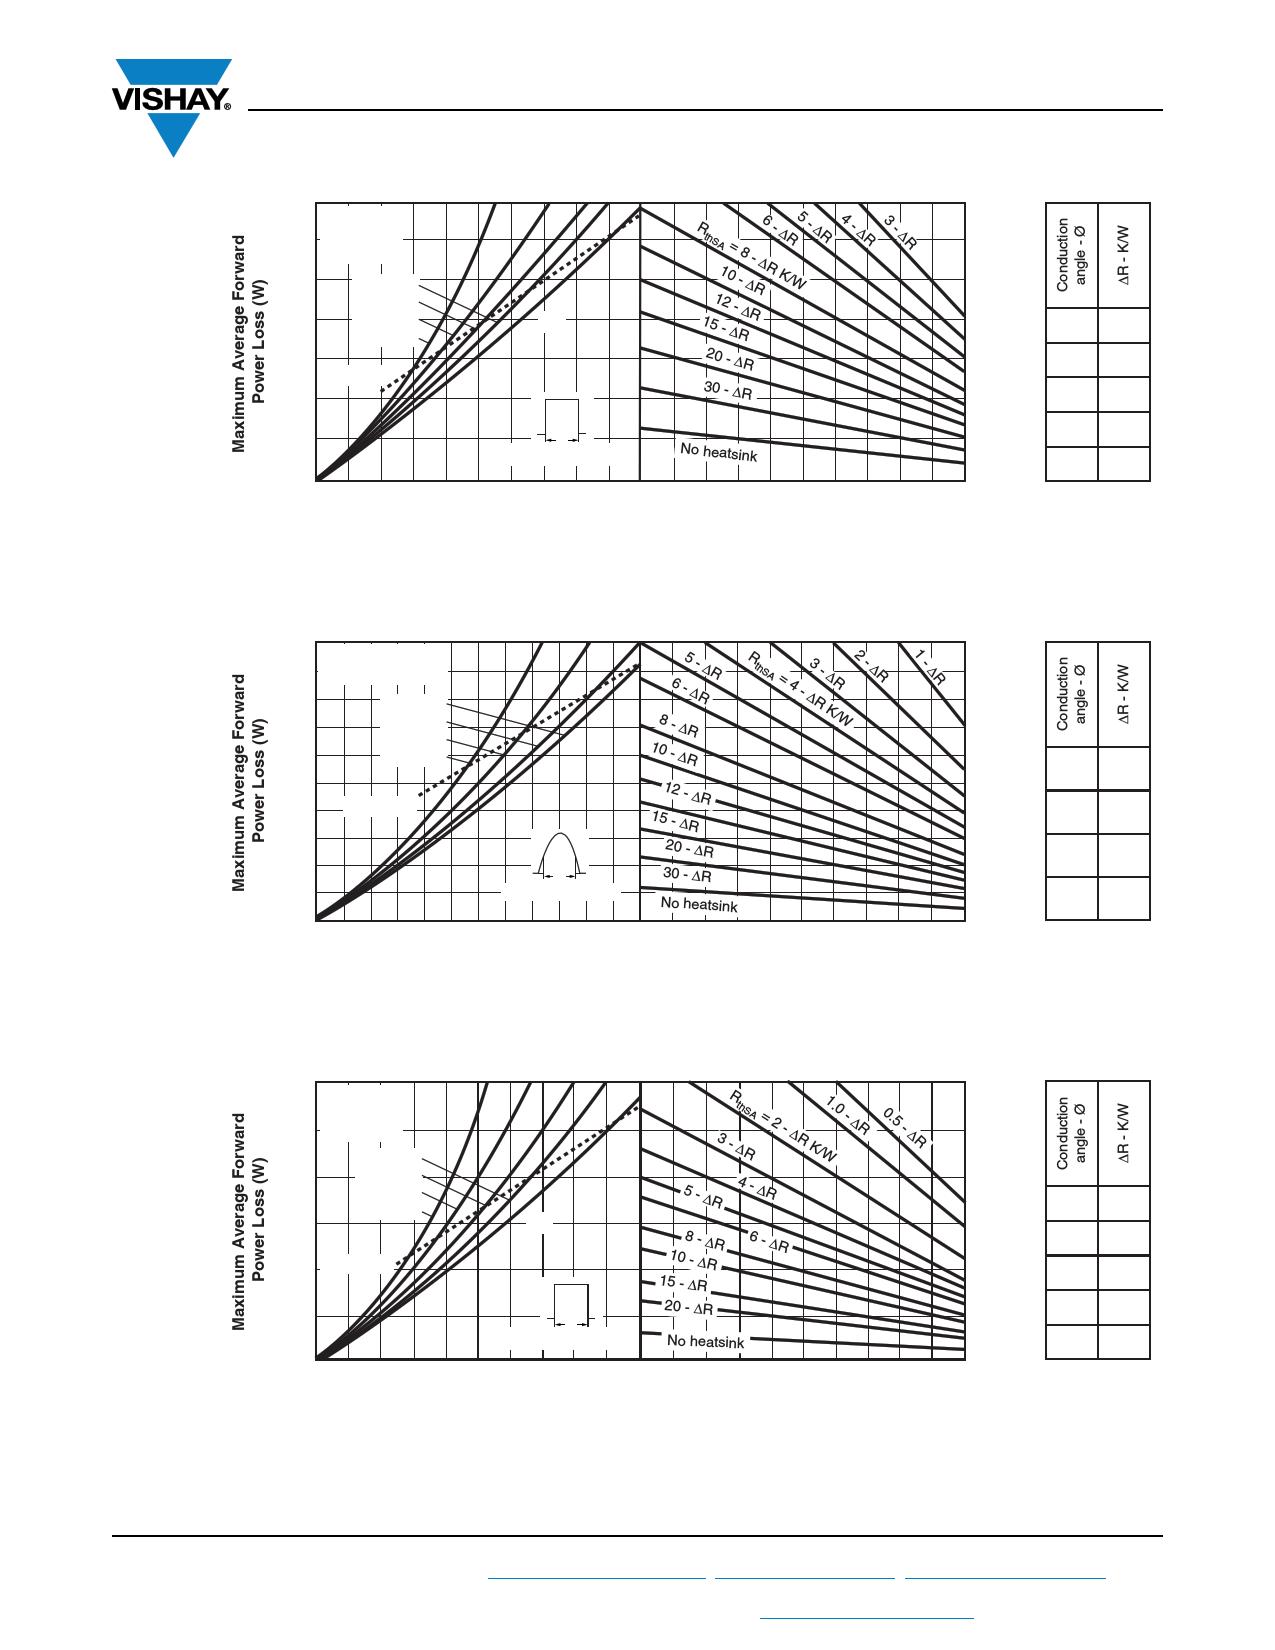 VS-1N3891 pdf